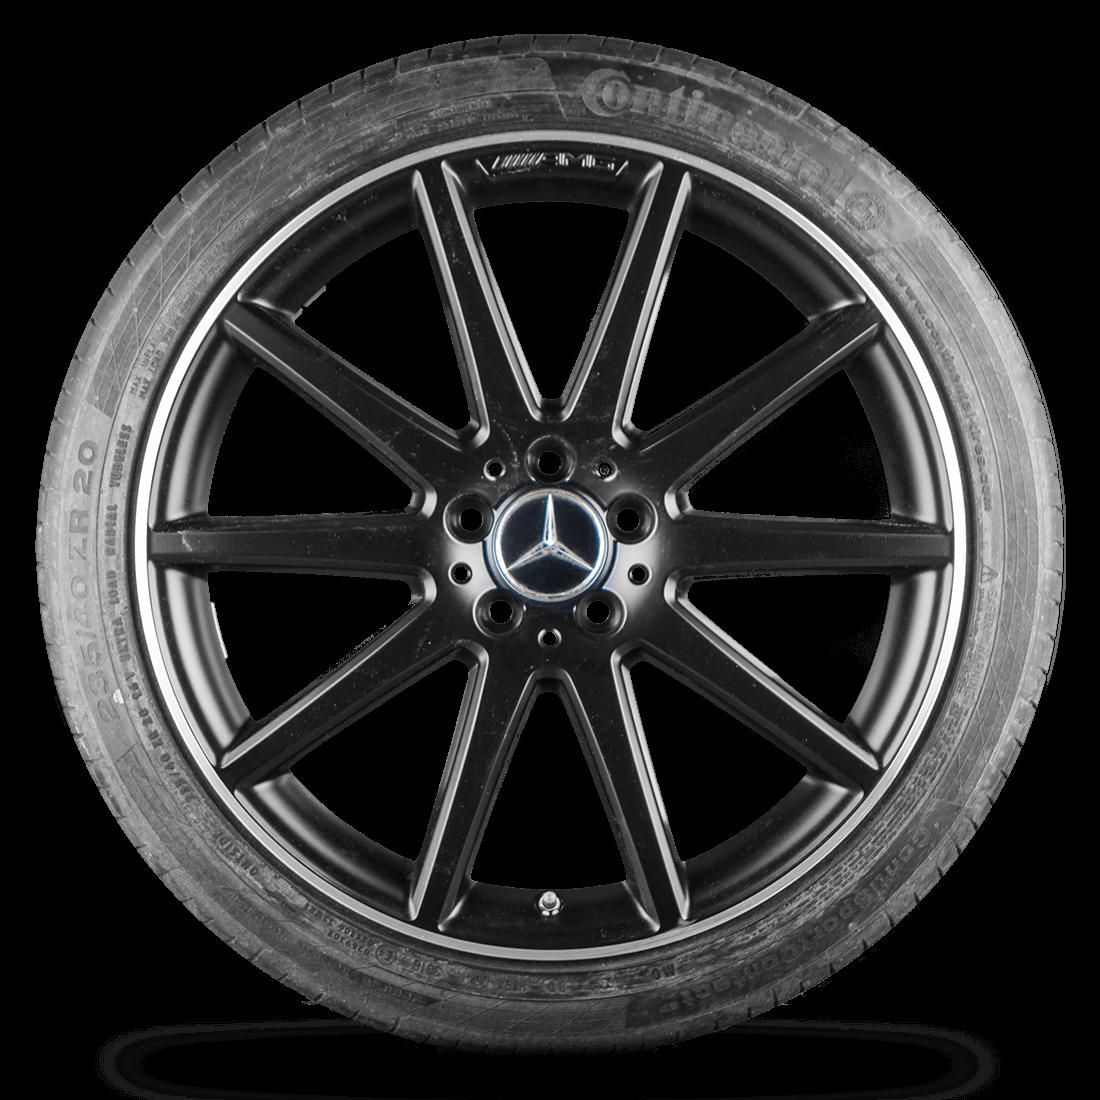 Mercedes-Benz GLA 45 Original AMG X156 20 Zoll Alufelgen Felgen Sommerräder